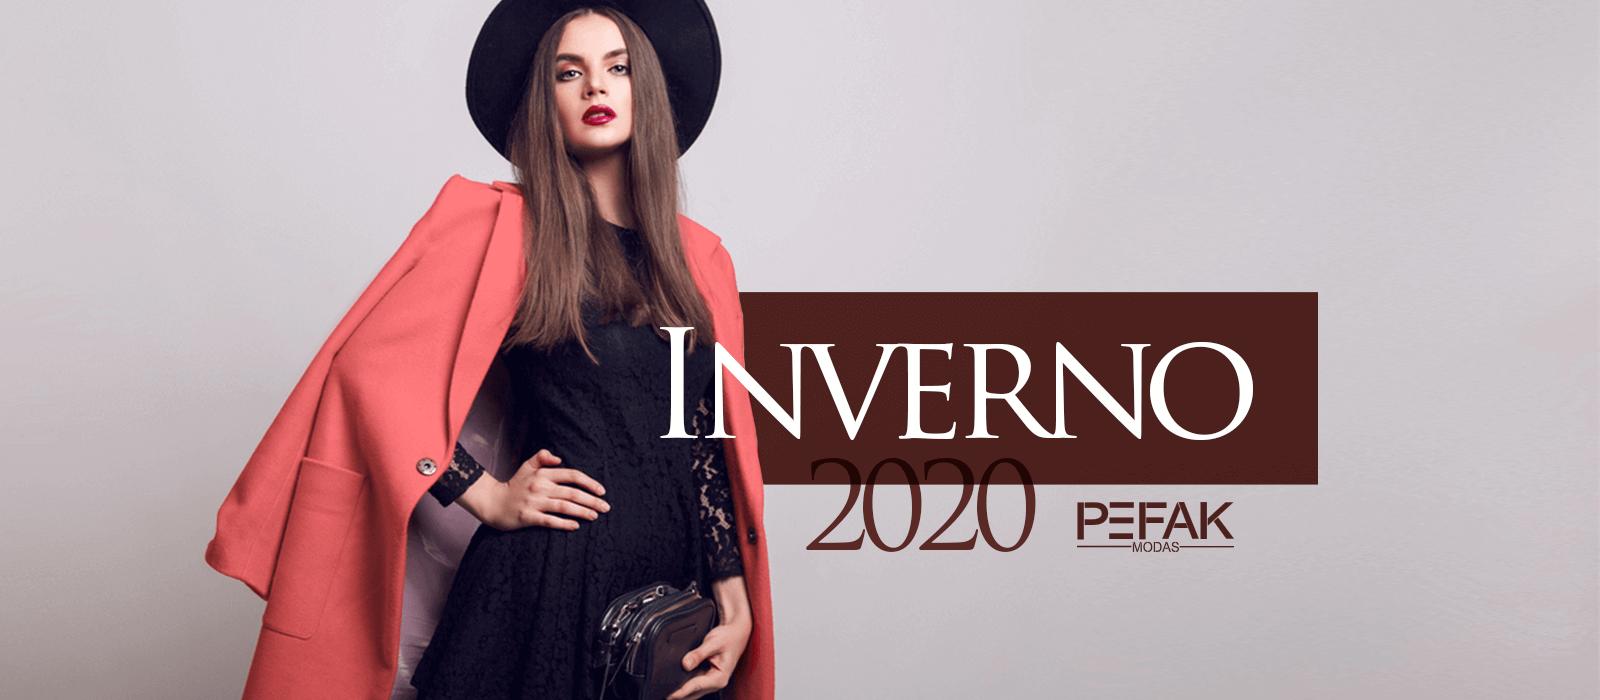 Inverno 2020 PEFAK Modas